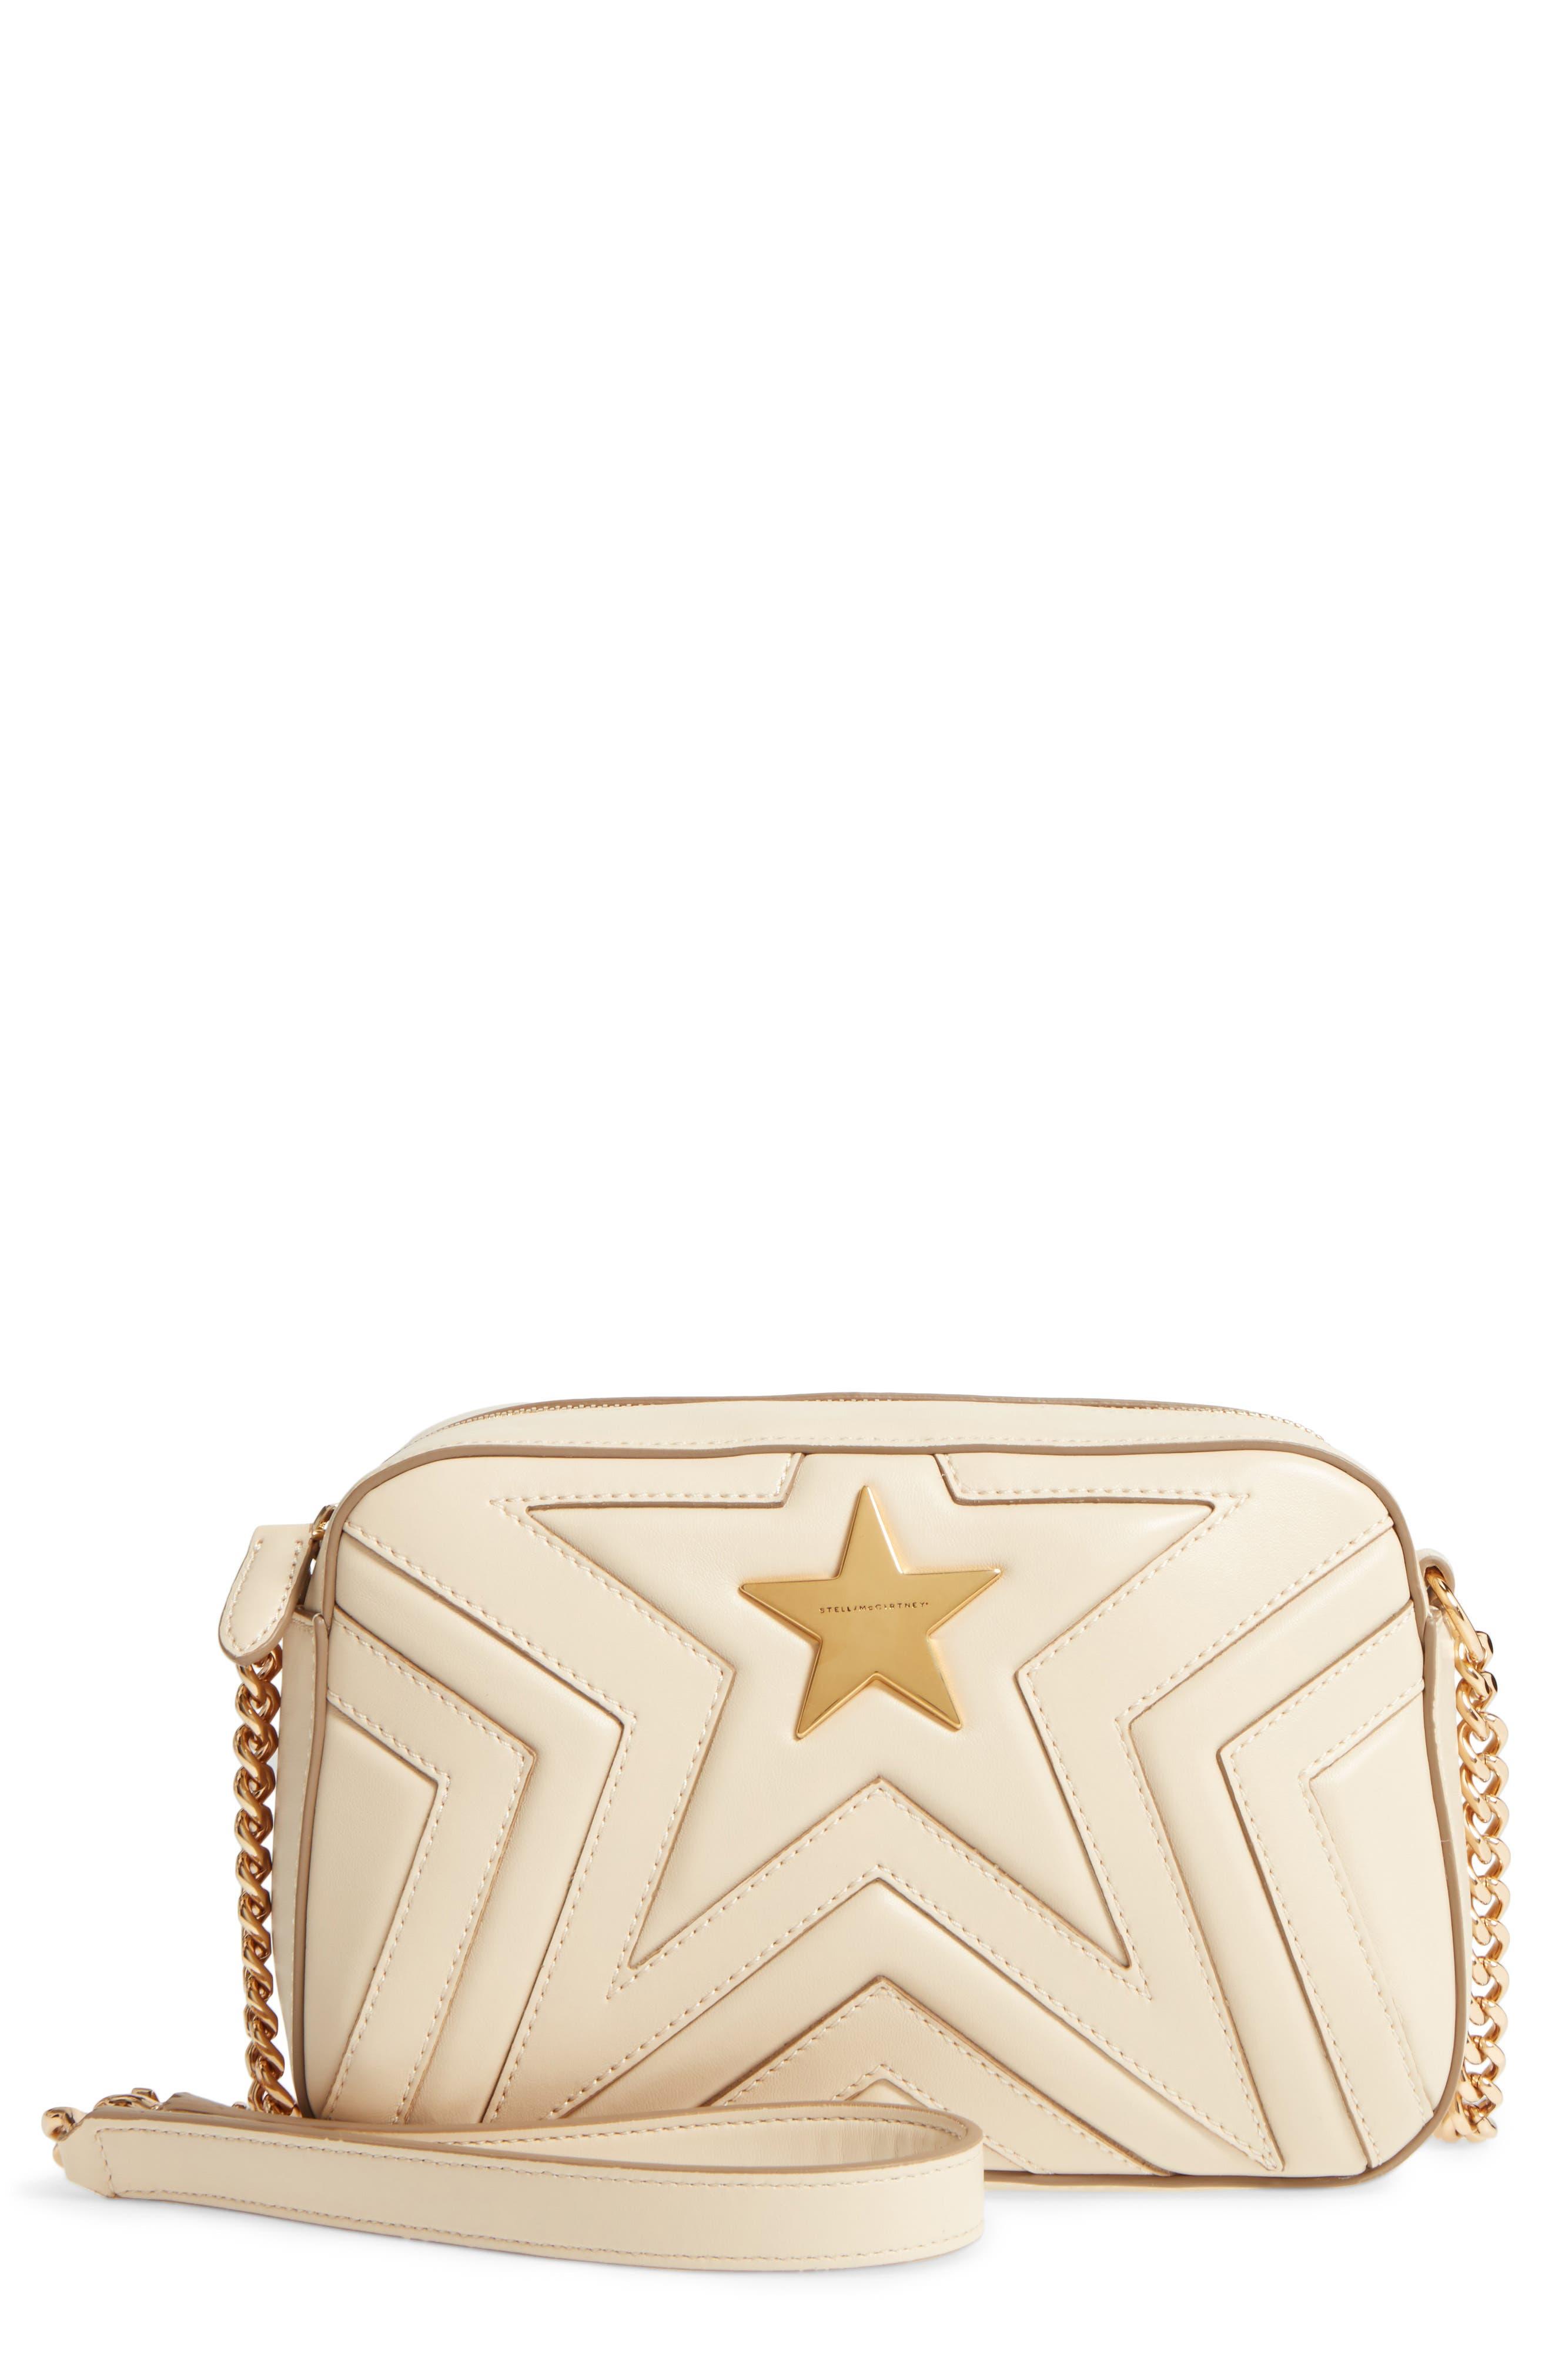 Alter Nappa Faux Leather Shoulder Bag,                         Main,                         color, Cream